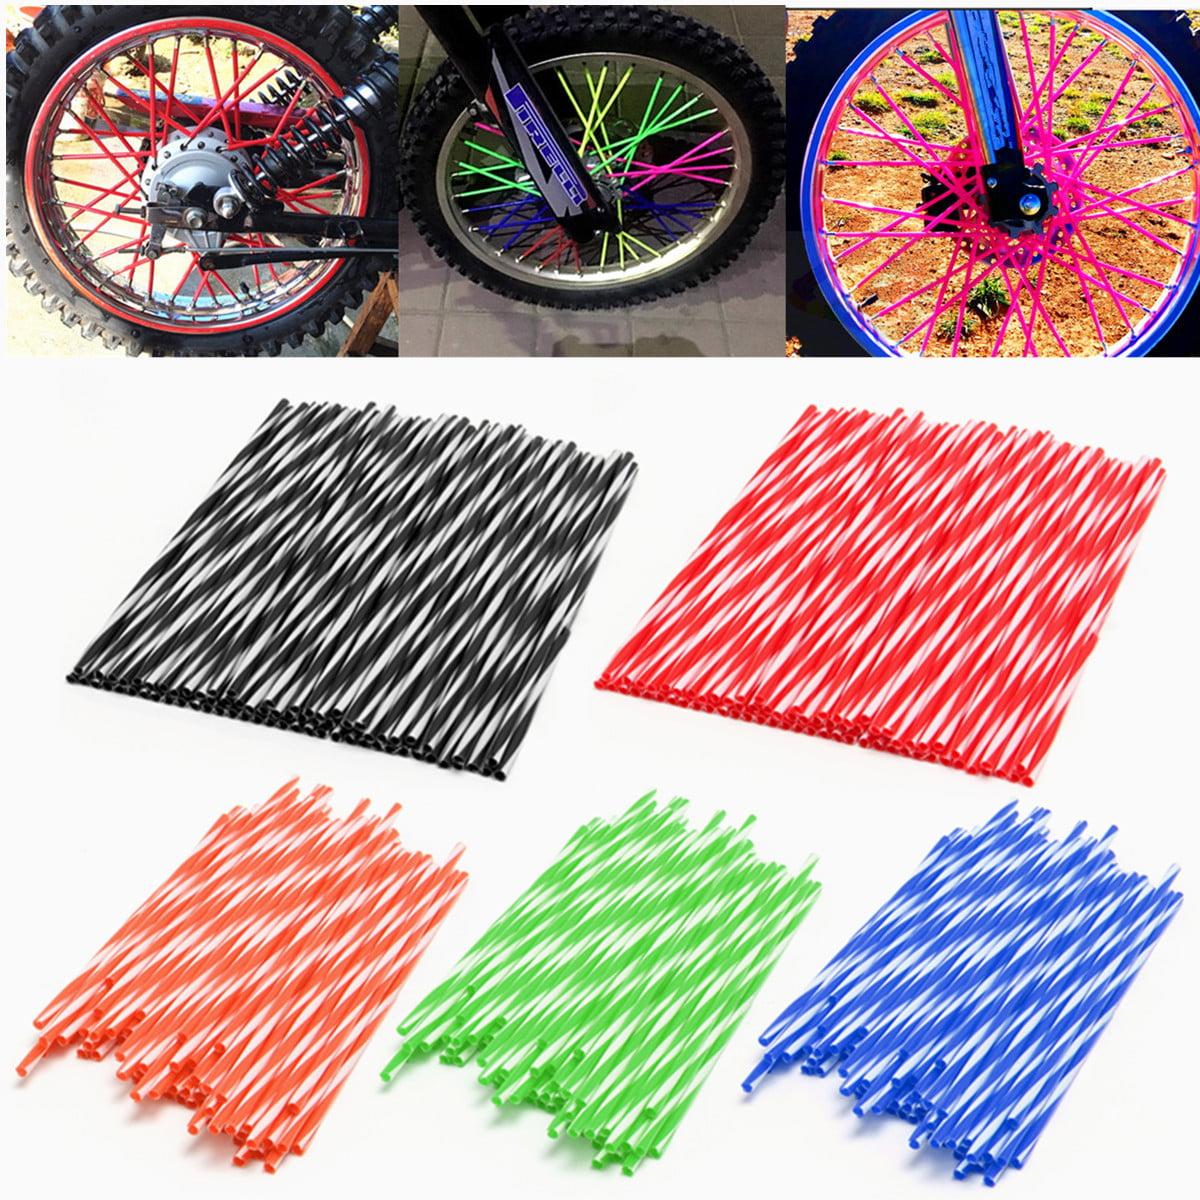 72PCS Spoke Skins Covers for Motocross Dirt Bike Wheel Rim Guard Protector Wraps